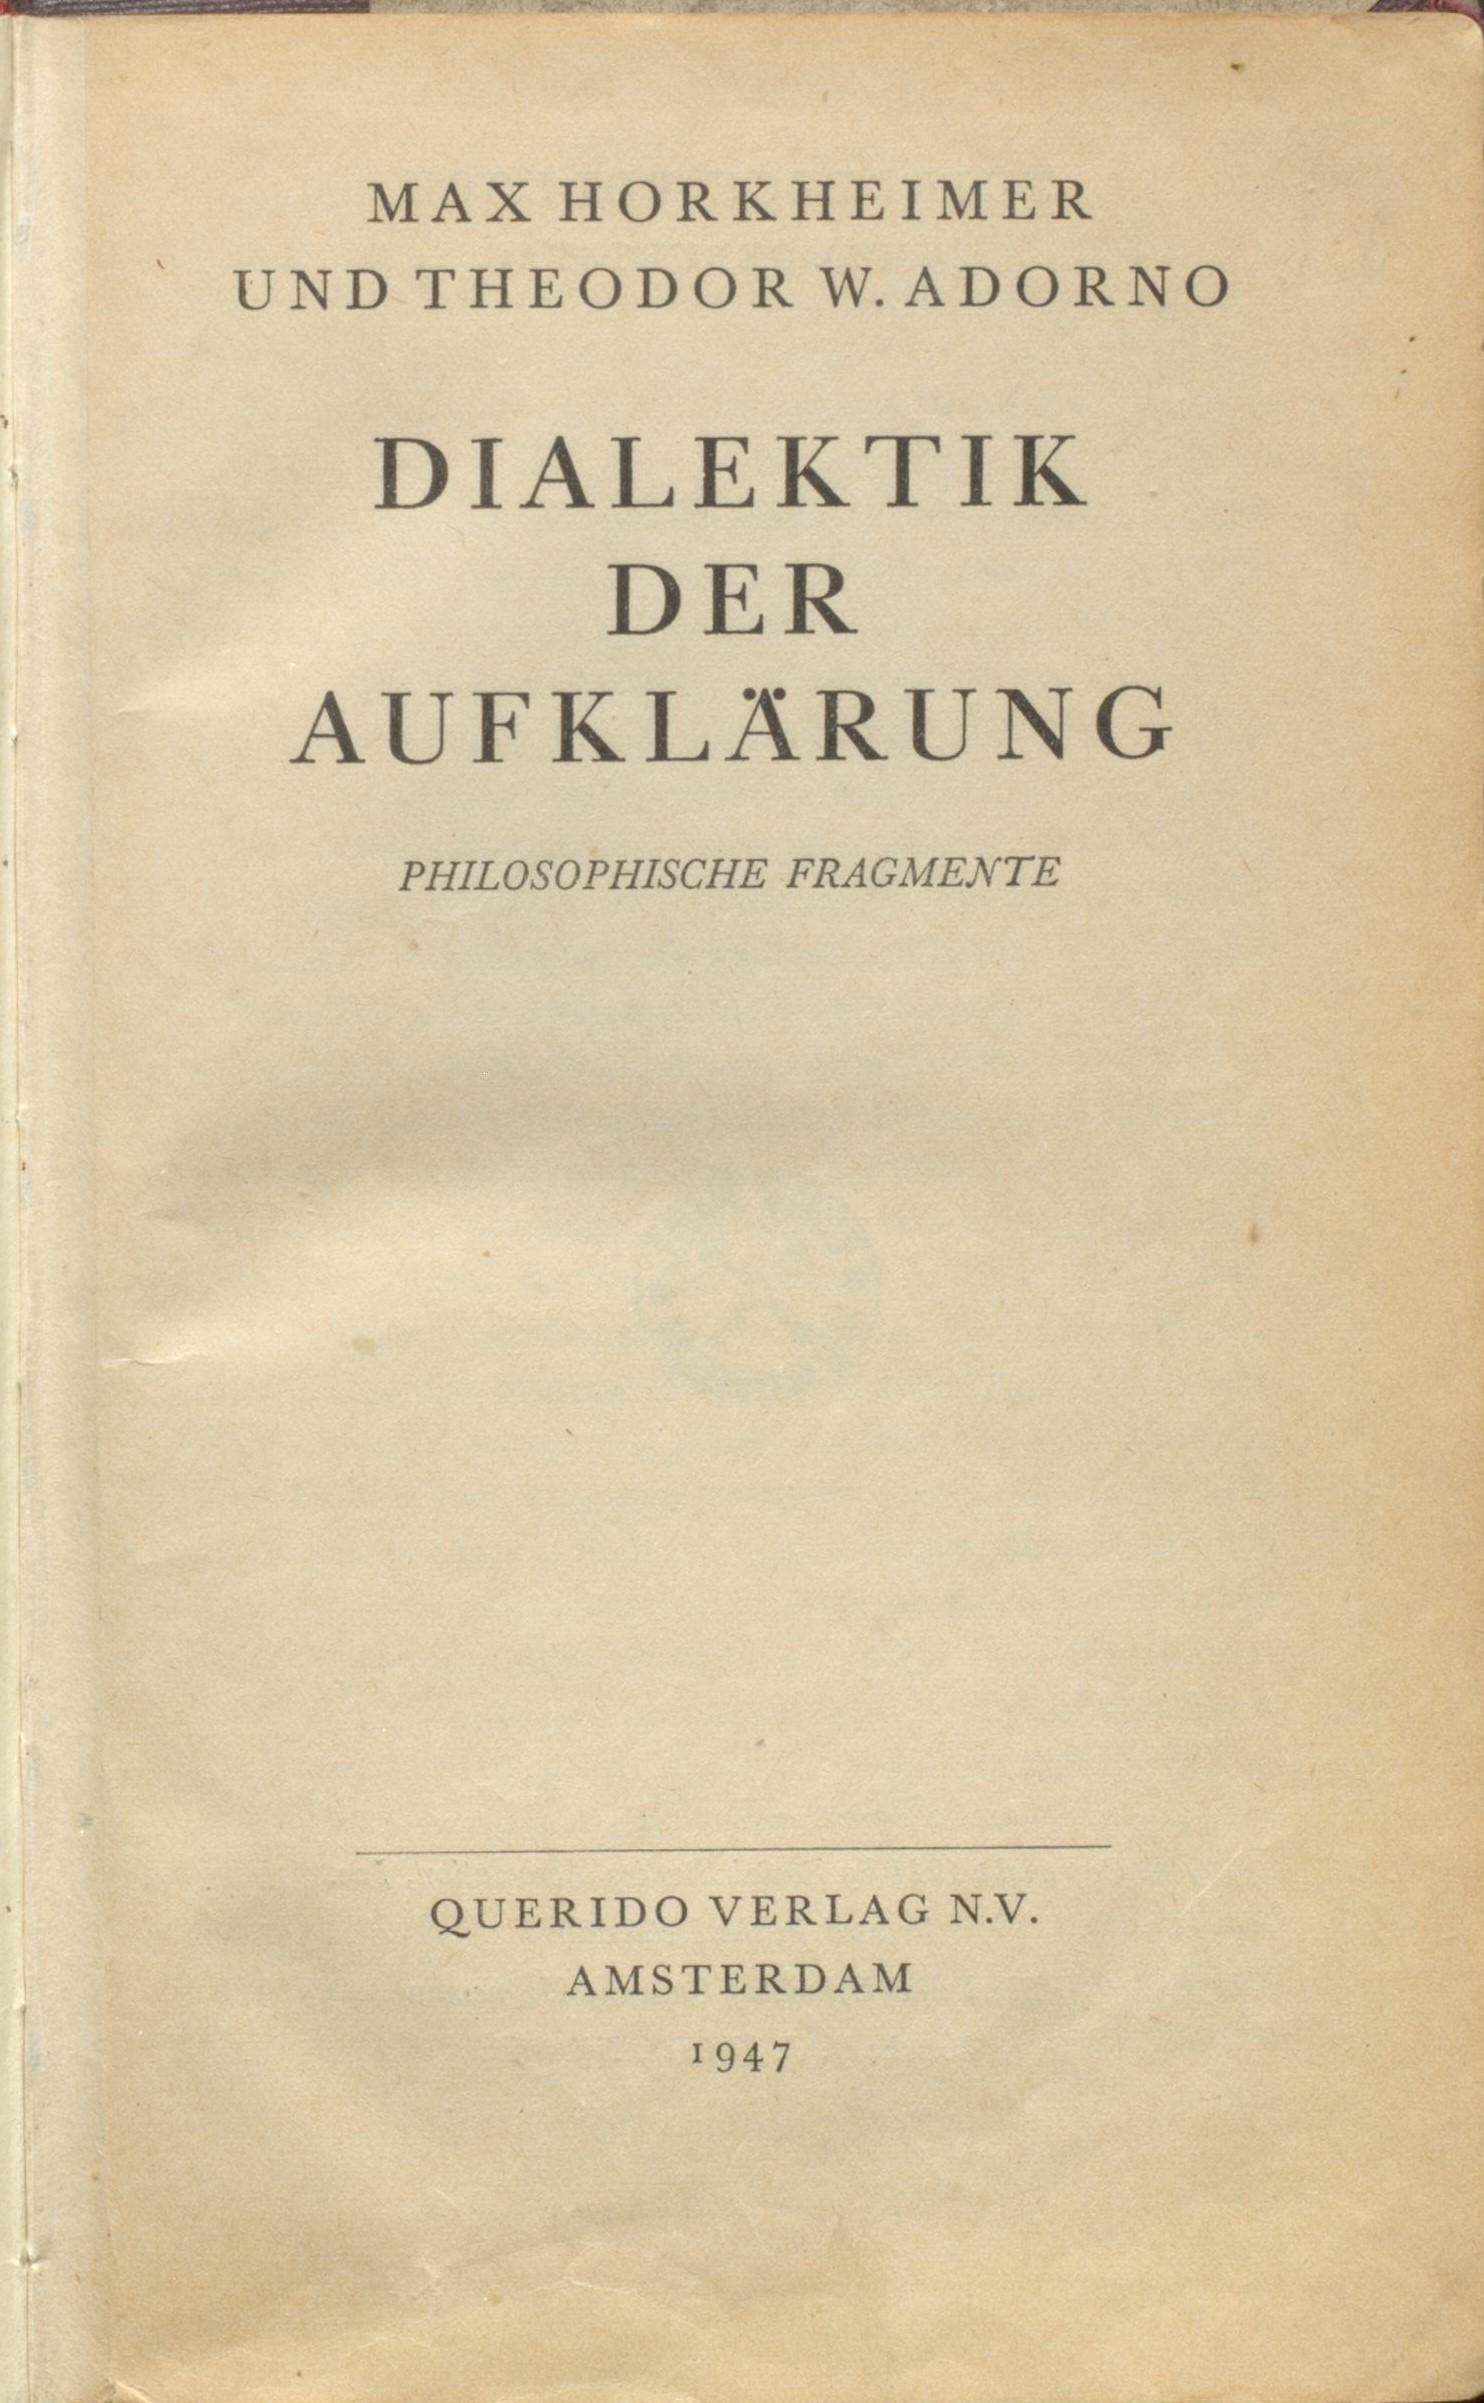 File:Max Horkheimer Theodor W. Adorno Dialektik der Aufklärung 1947  Titel.jpg - Wikimedia Commons